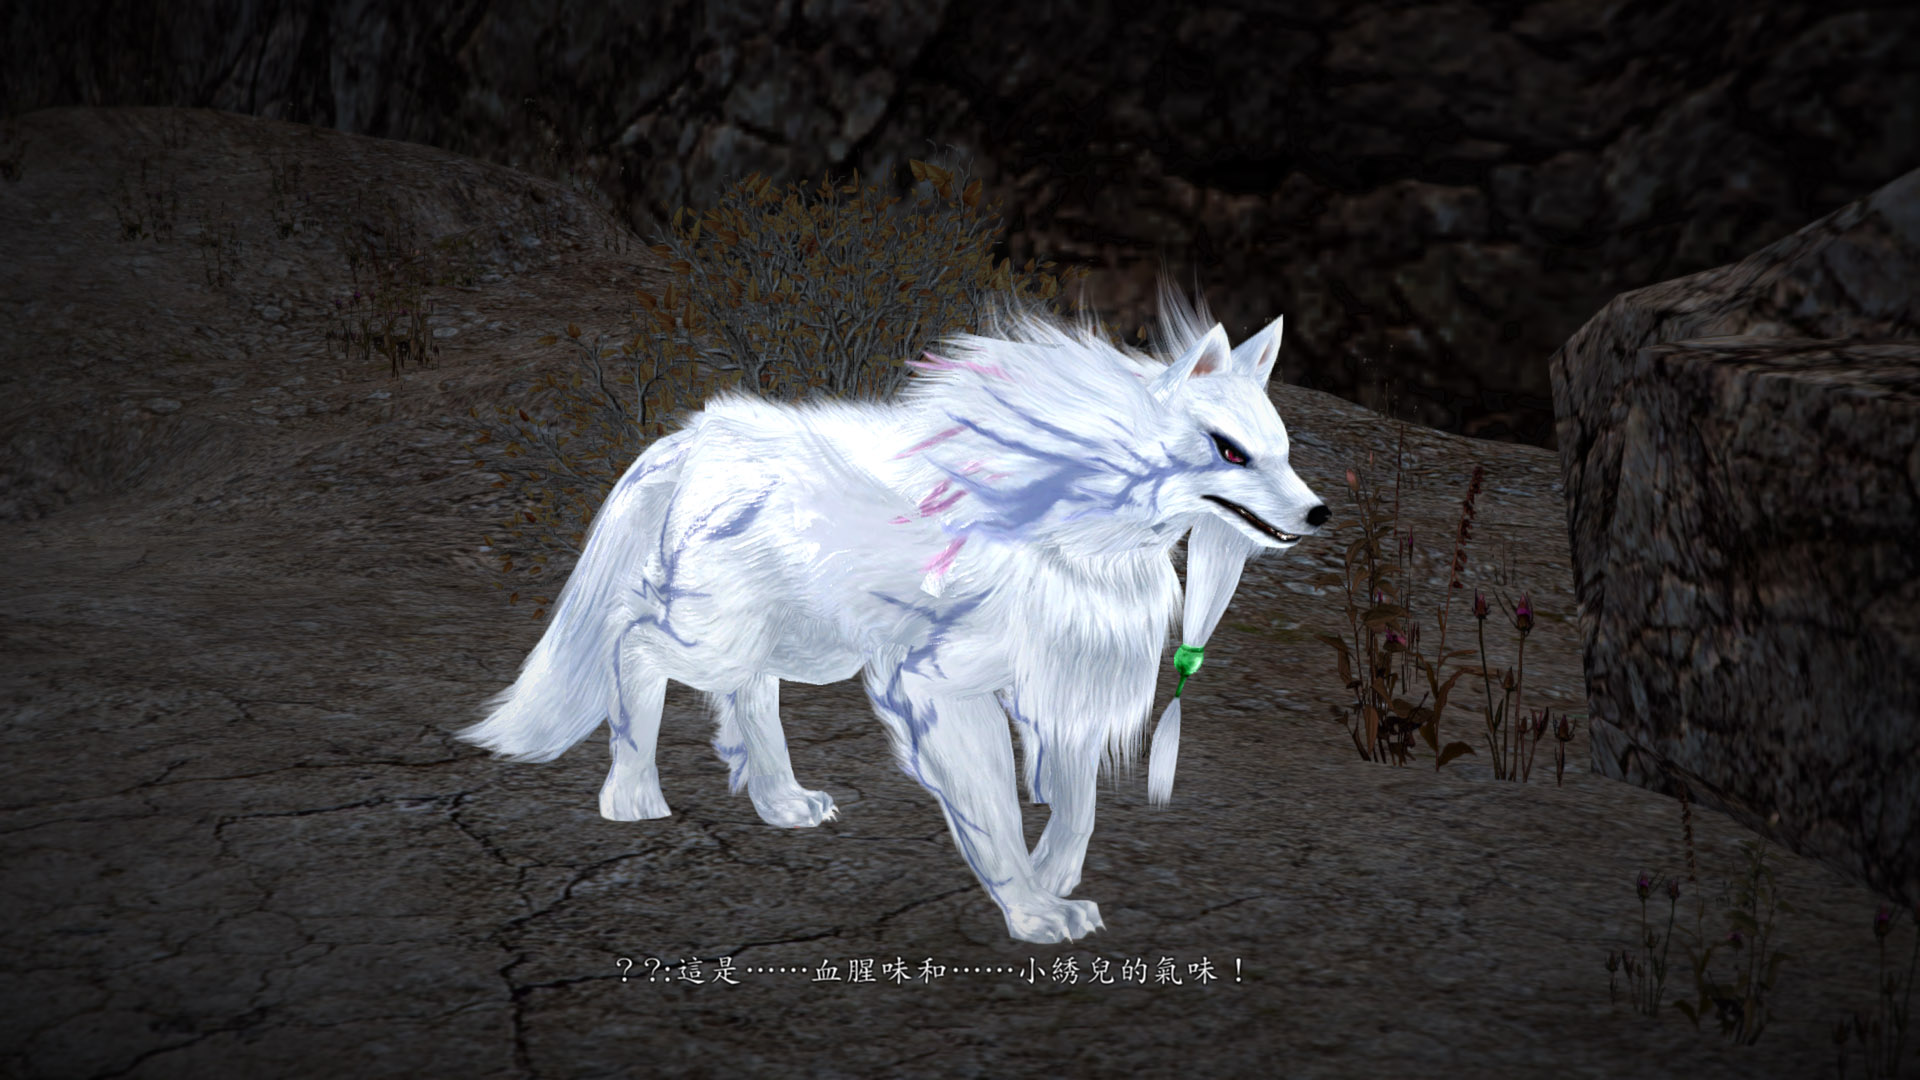 PS4《仙剑奇侠传六》公布更多中文截图,现己于各零售通路开放预购!